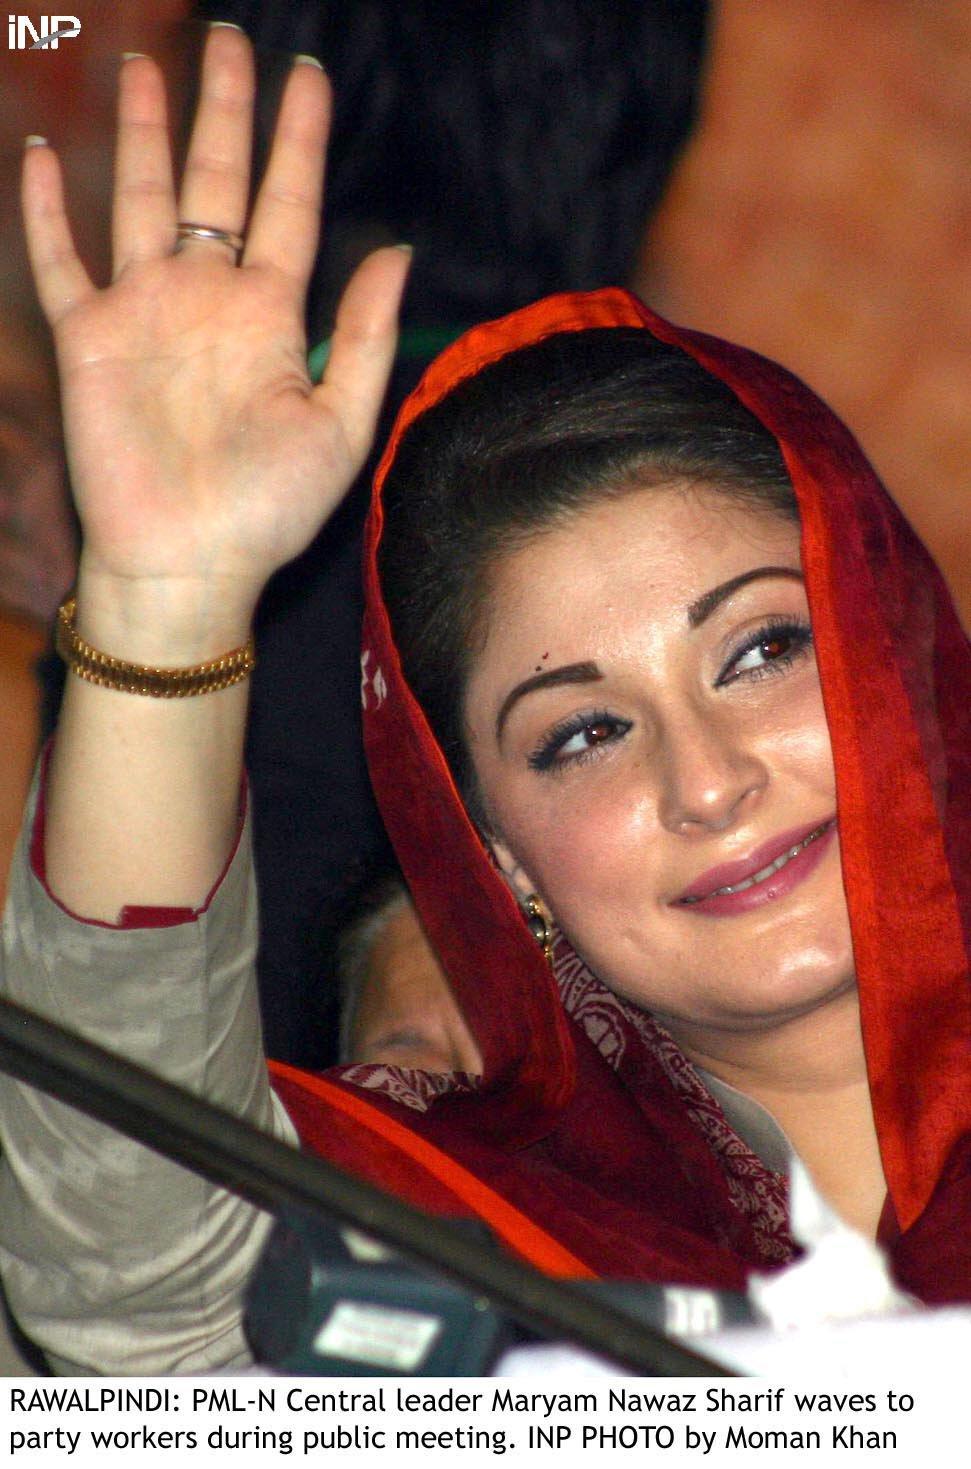 Prime Minister Nawaz Sharif's daughter Maryam Nawaz. PHOTO: INP / FILE